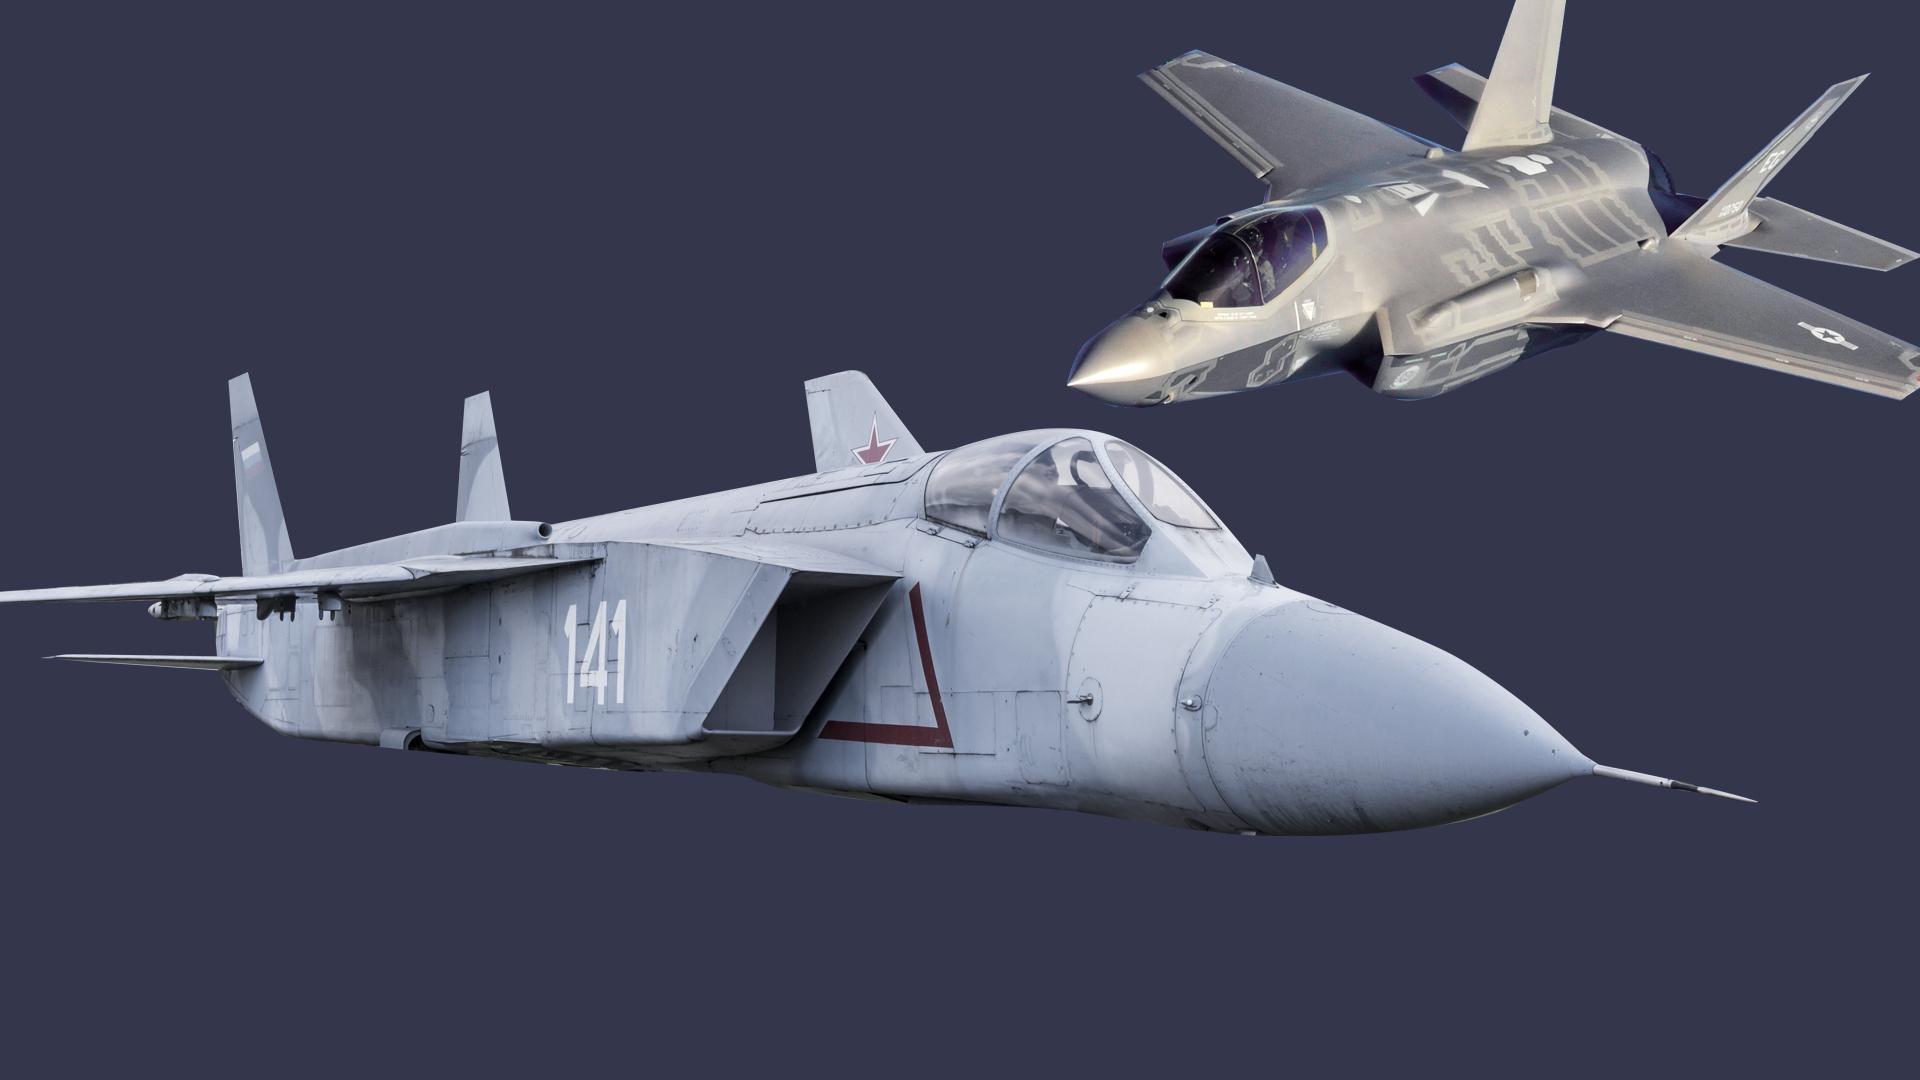 "<p>Коллаж © LIFE. Фото ©<a href=""https://ru.wikipedia.org/wiki/F-35#/media/%D0%A4%D0%B0%D0%B9%D0%BB:F-35A_flight_(cropped).jpg"" target=""_blank"" rel=""noopener noreferrer""> Wikipedia</a>, © Shutterstock</p>"